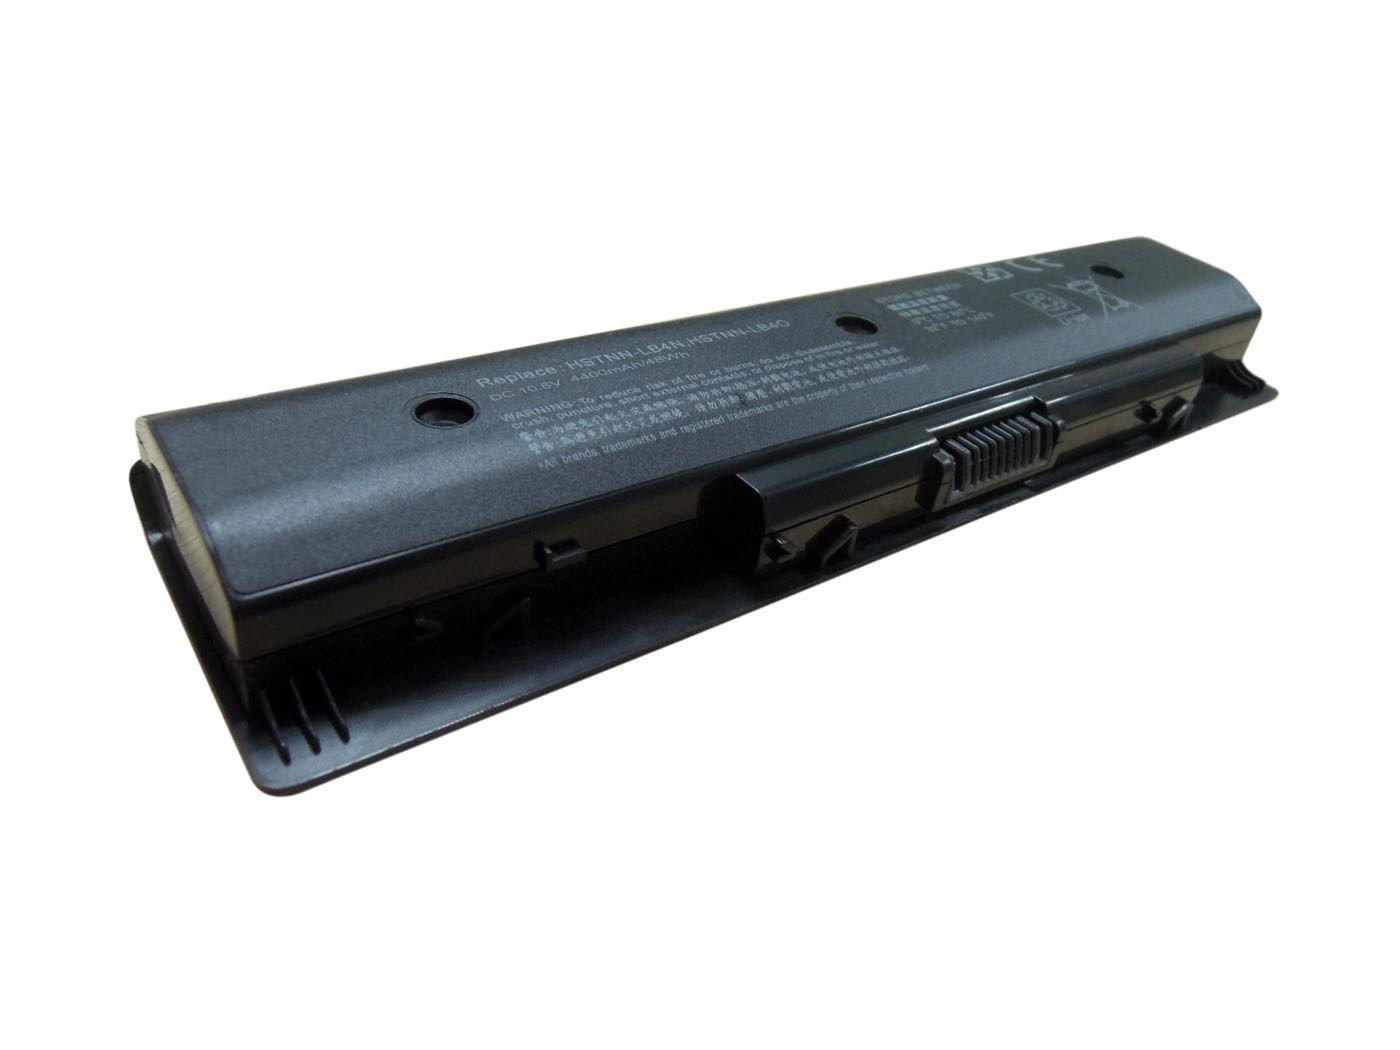 HP touchsmart 17 touchsmart 17z, P106 Series laptop battery